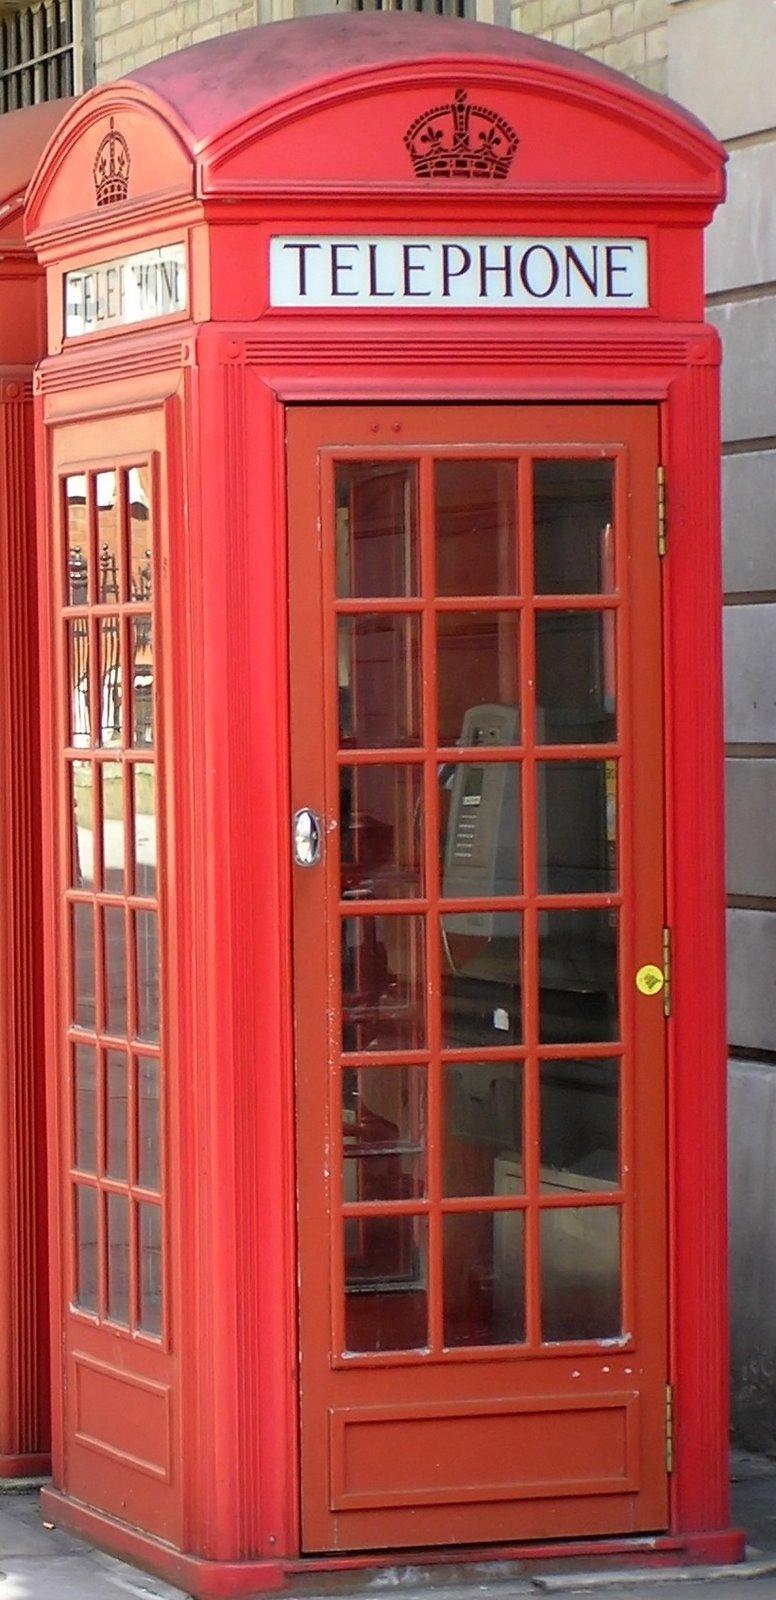 [redtelephonebox.jpg]